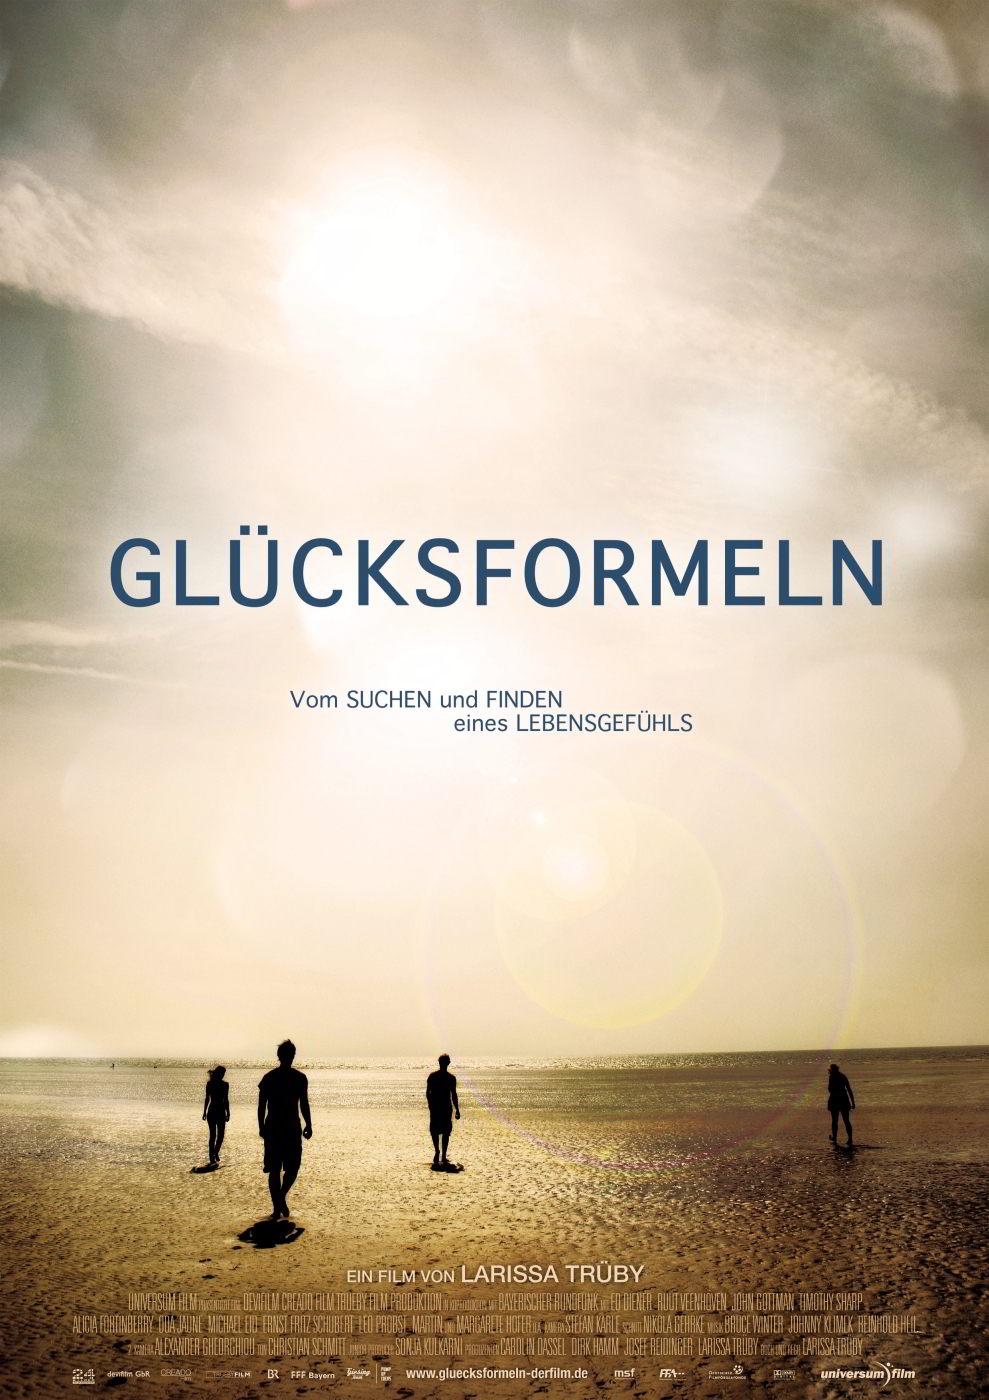 vieregg text redaktion lektorat + SV Verlag: Mai 2011